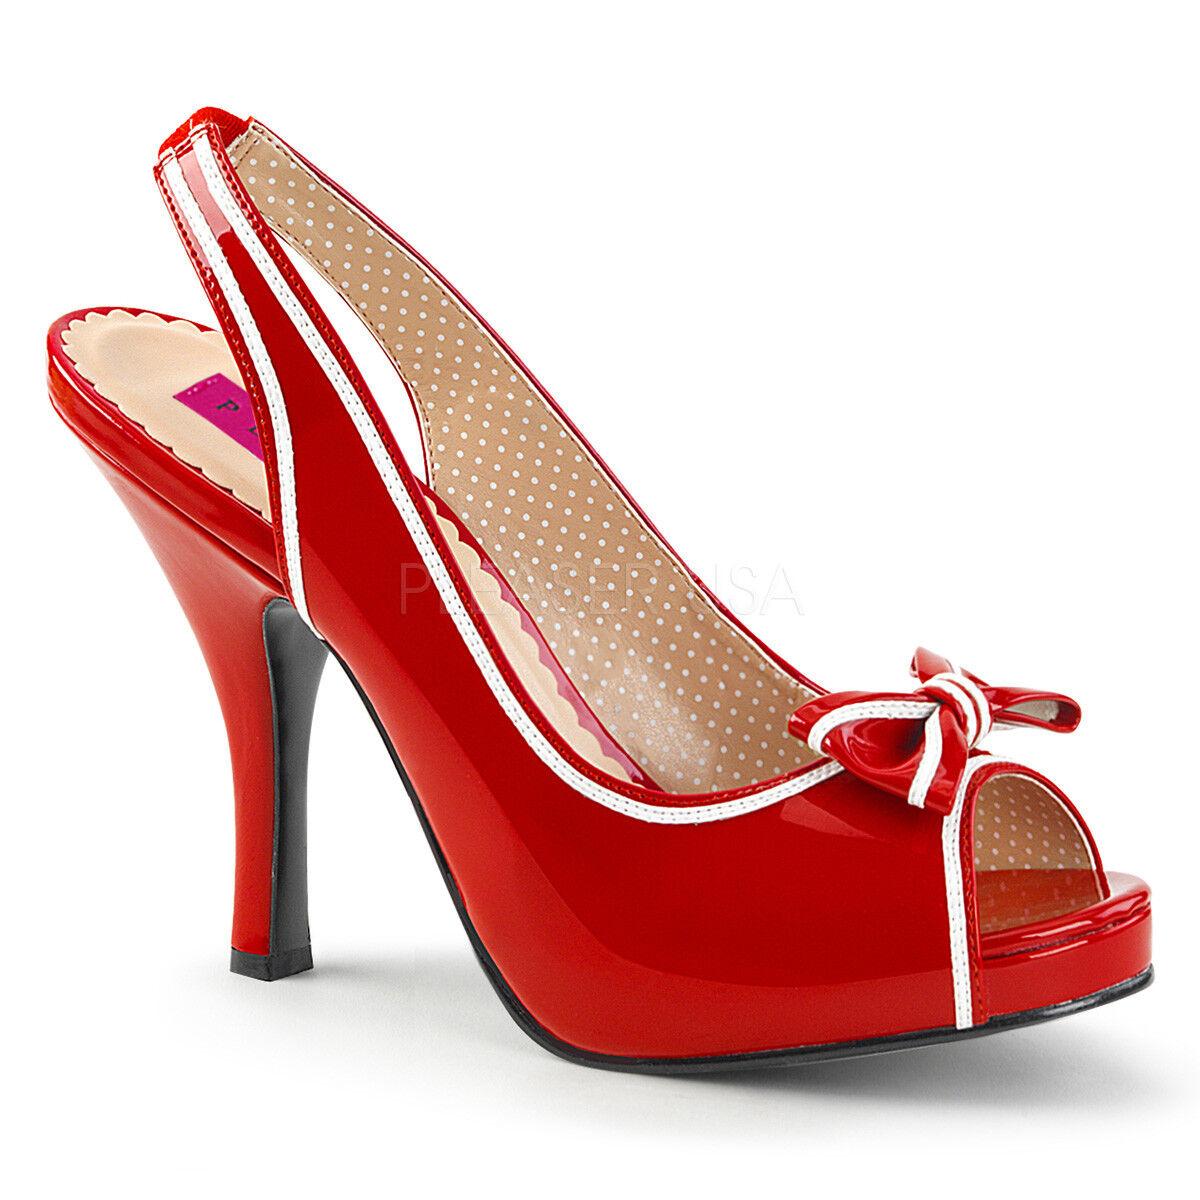 Pleaser PINUP-10 PINUP-10 PINUP-10 Women's Red White Patent Slingback Hidden Platform Pump Sandals 2ec926